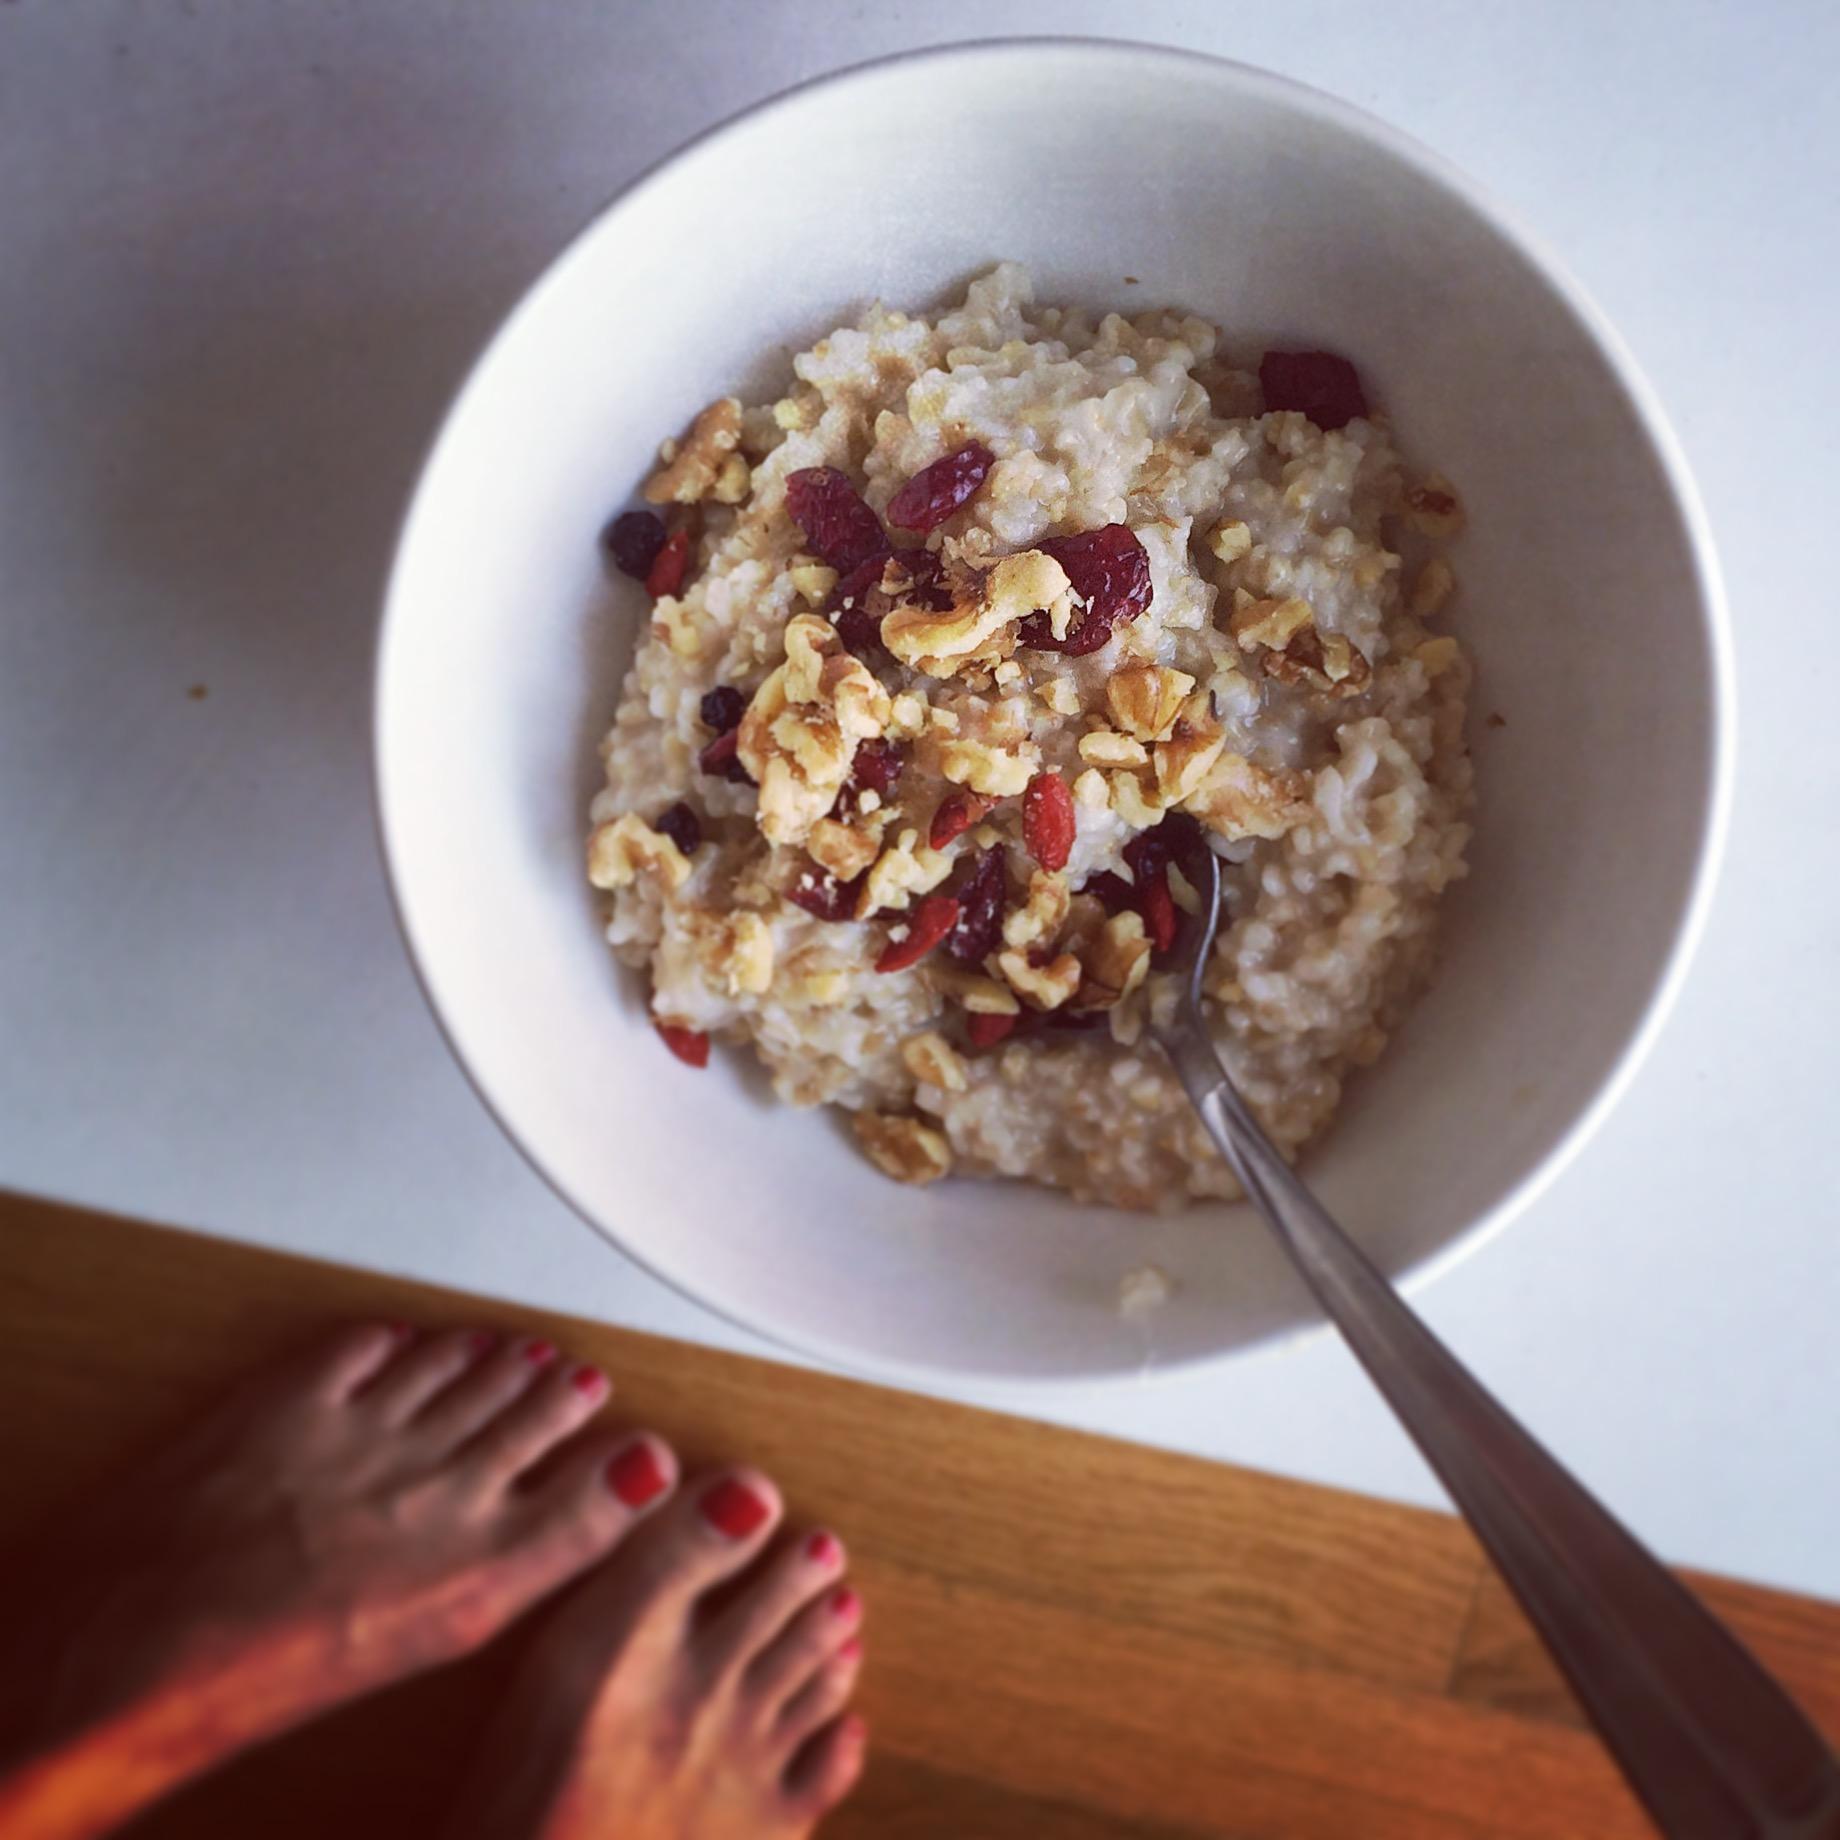 Gluten-free steel cut oats, crushed raw walnuts, raw farm honey, cinnamon, organic dried berries with a cup of green tea.